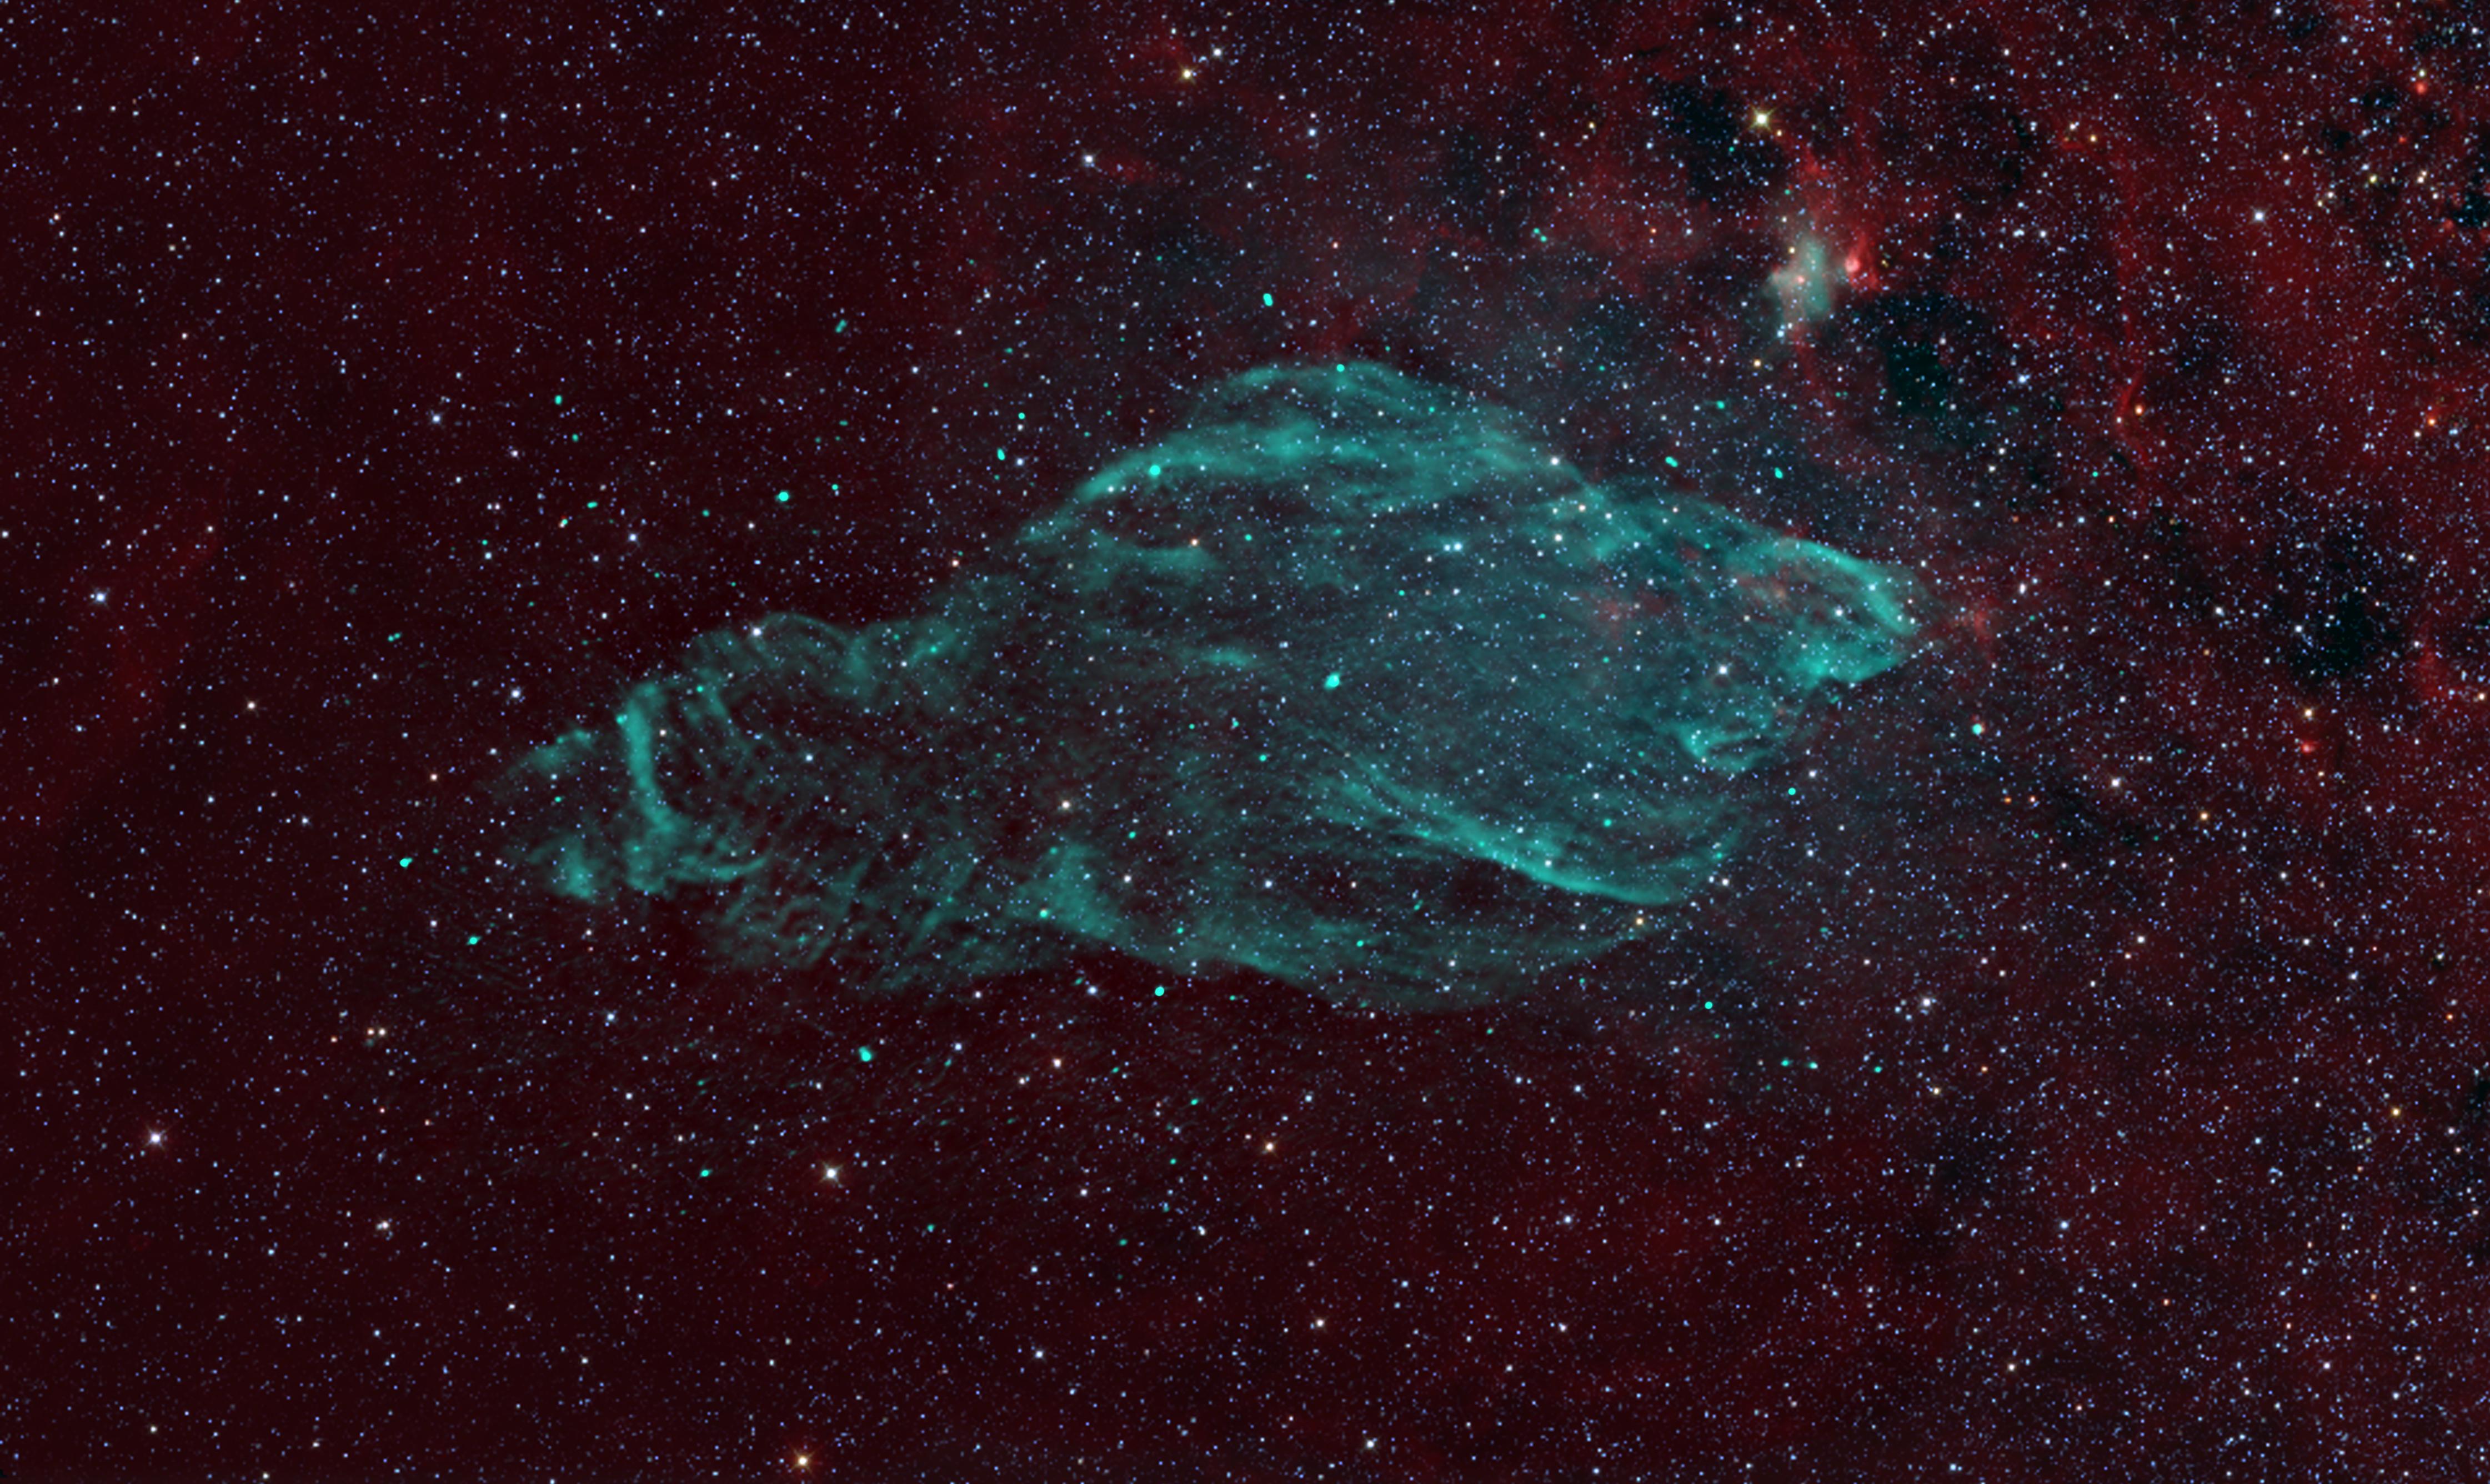 Celestial Wonder Looks Uncannily Like a Manatee